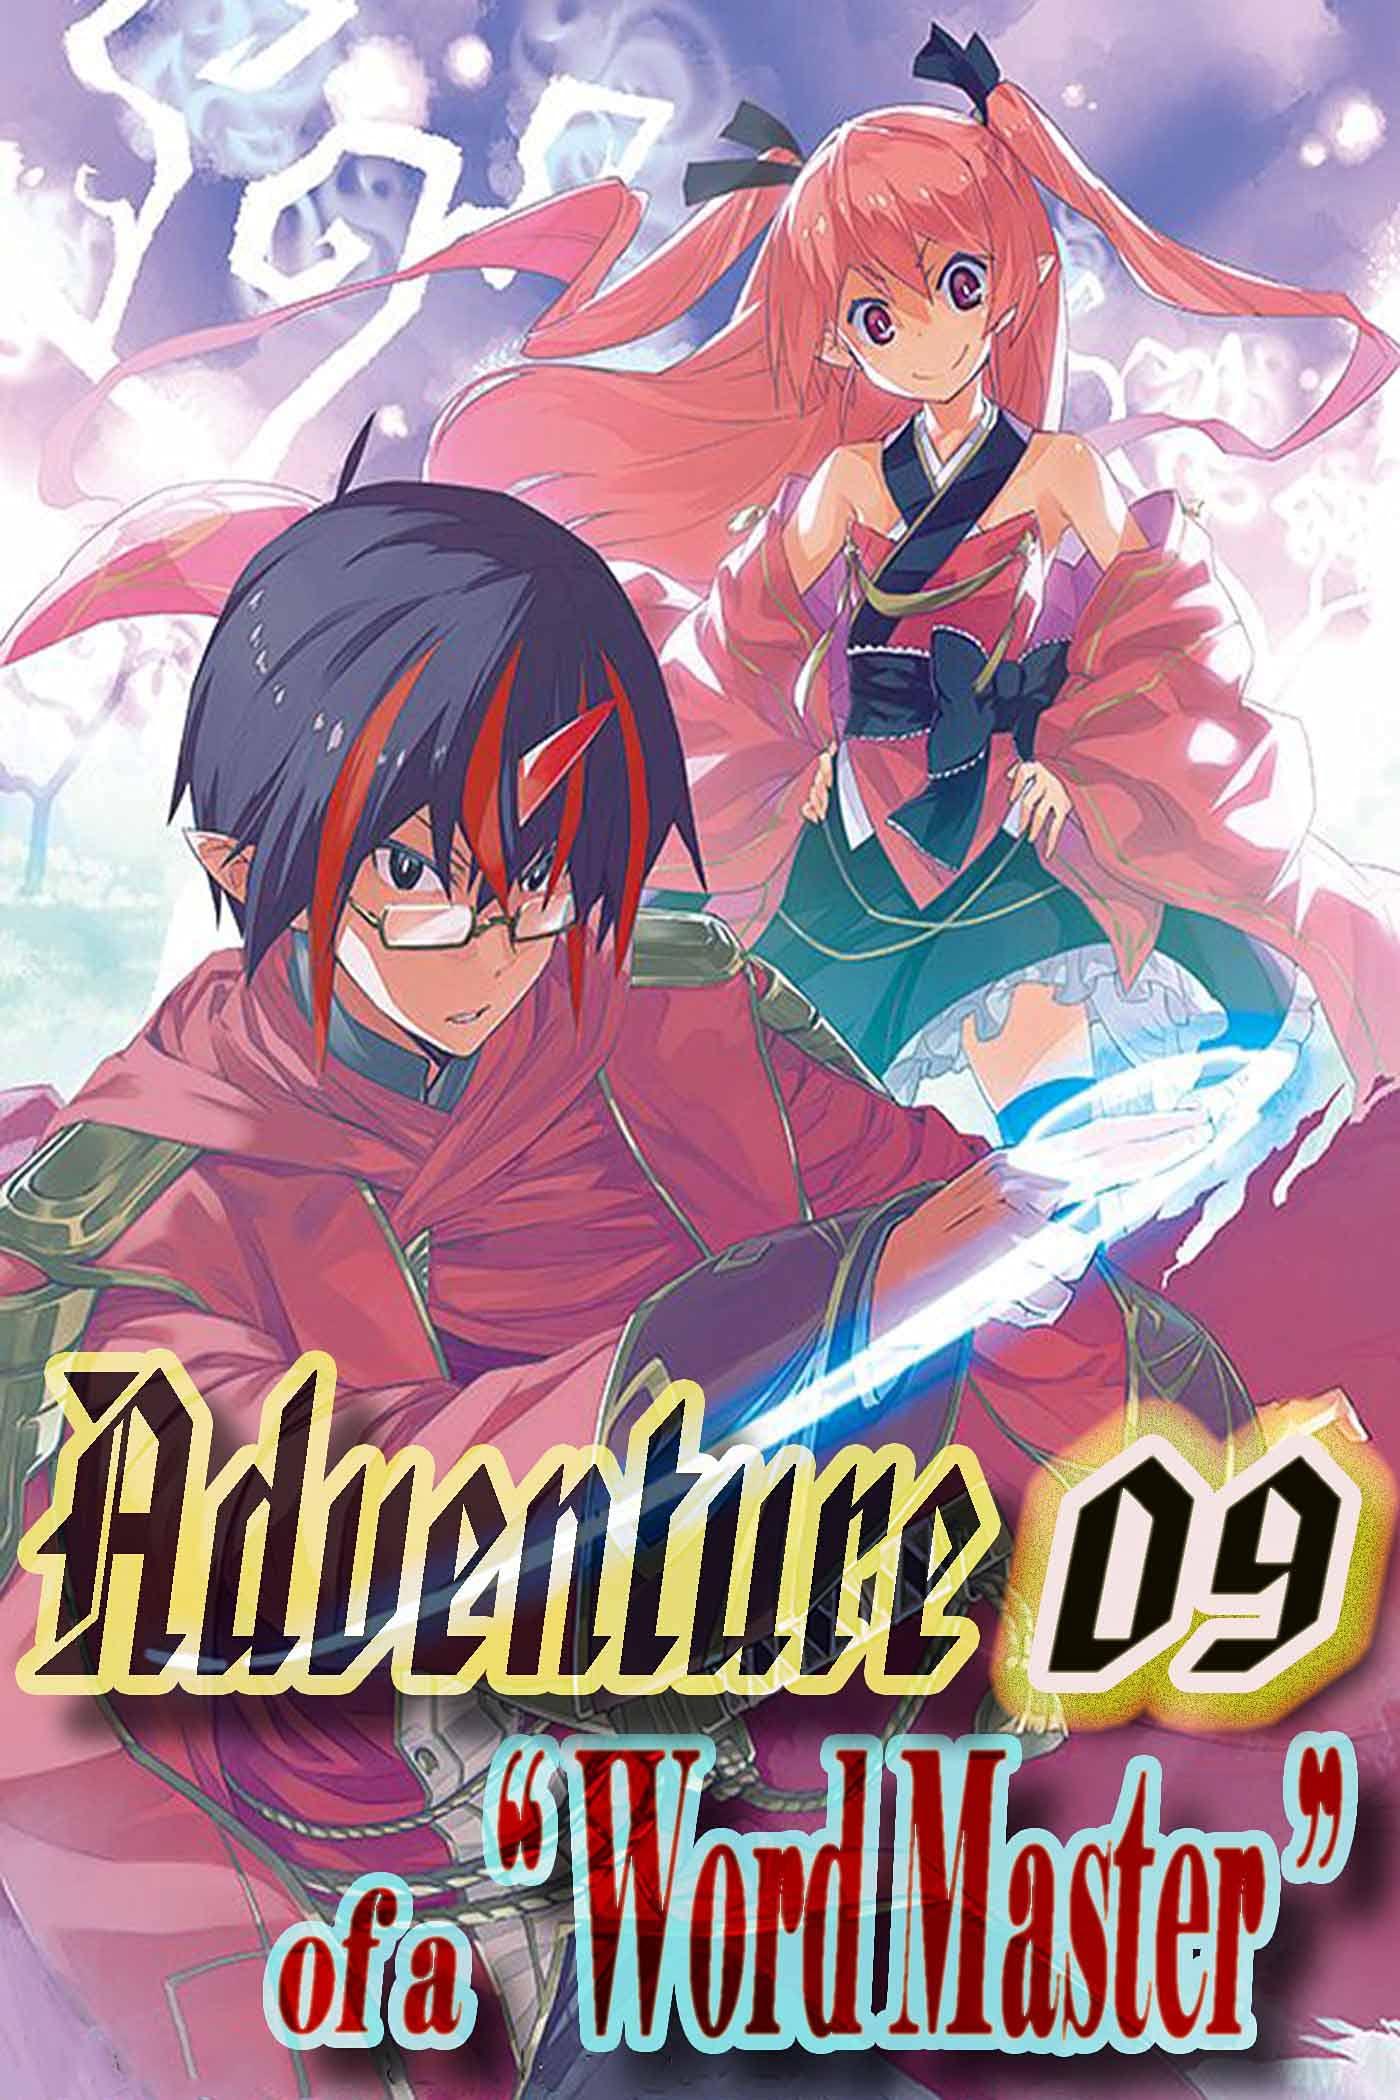 Loner adventure in fantasy World: Unique Class: Word Master Manga Vol 9